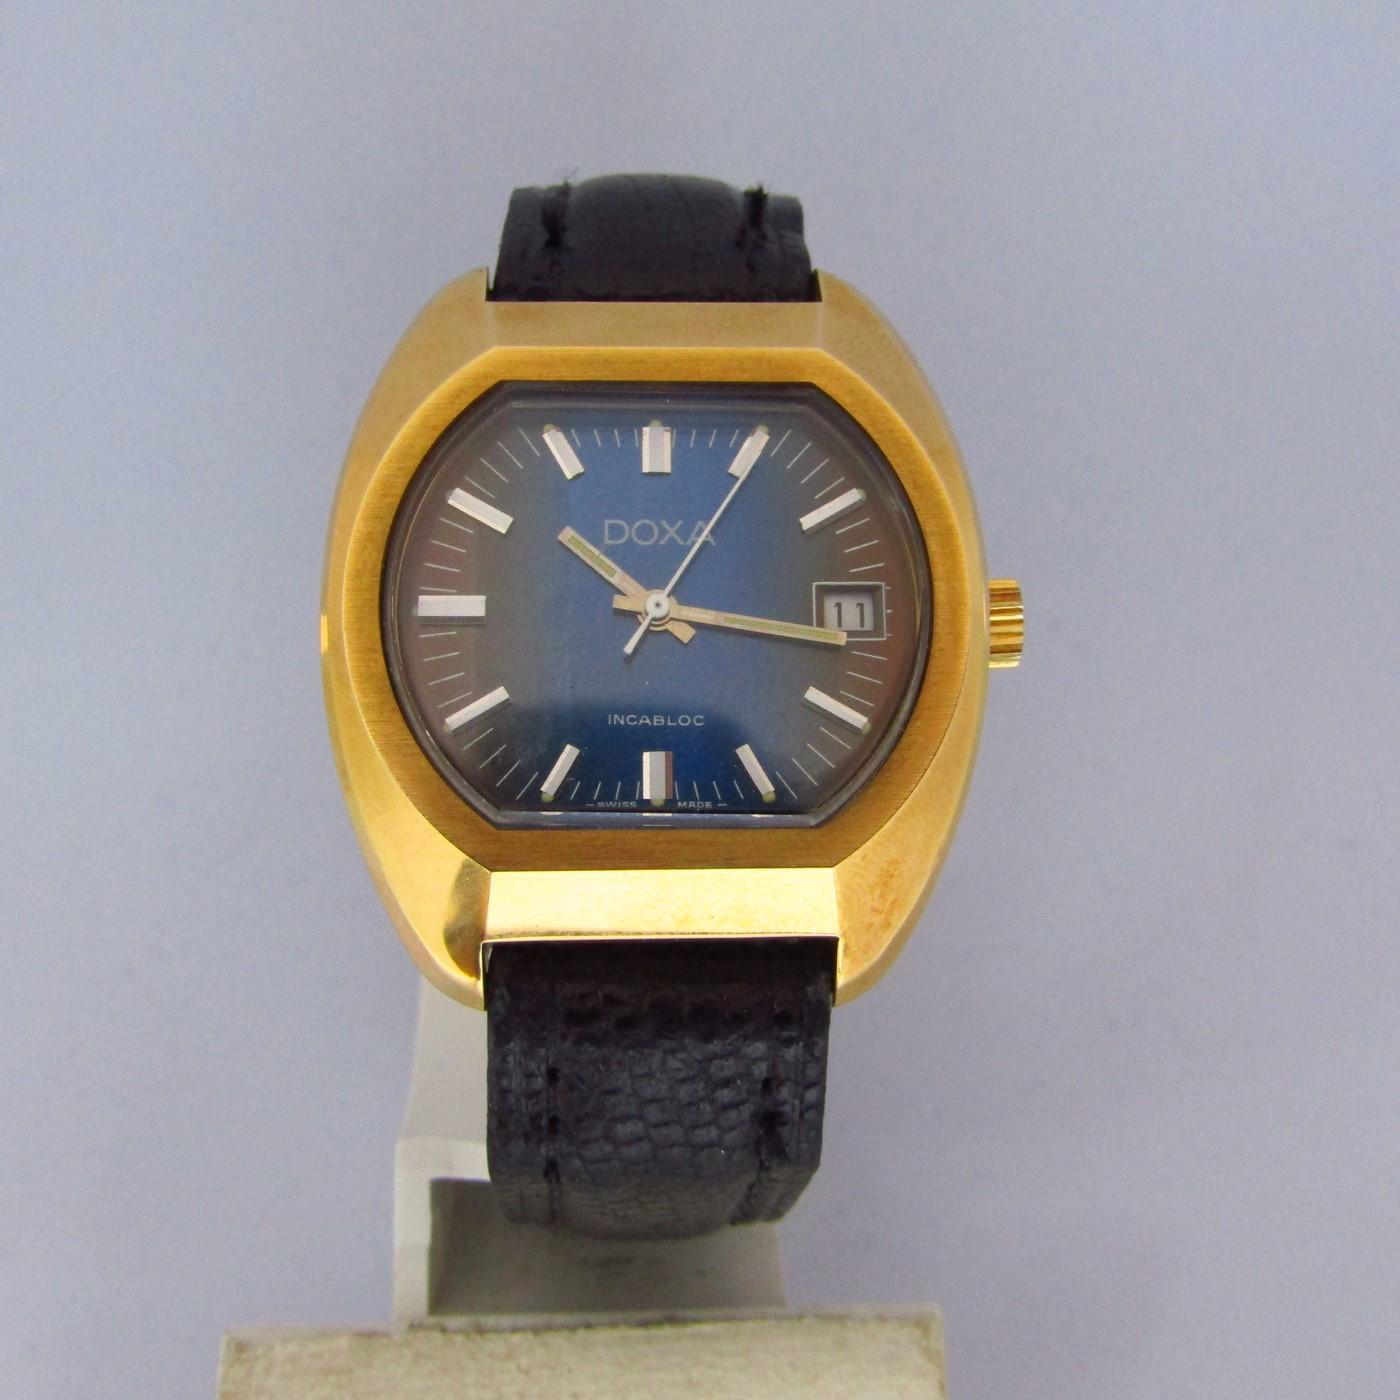 DOXA INCABLOC. Reloj de pulsera para caballero. Suiza, ca. 1970